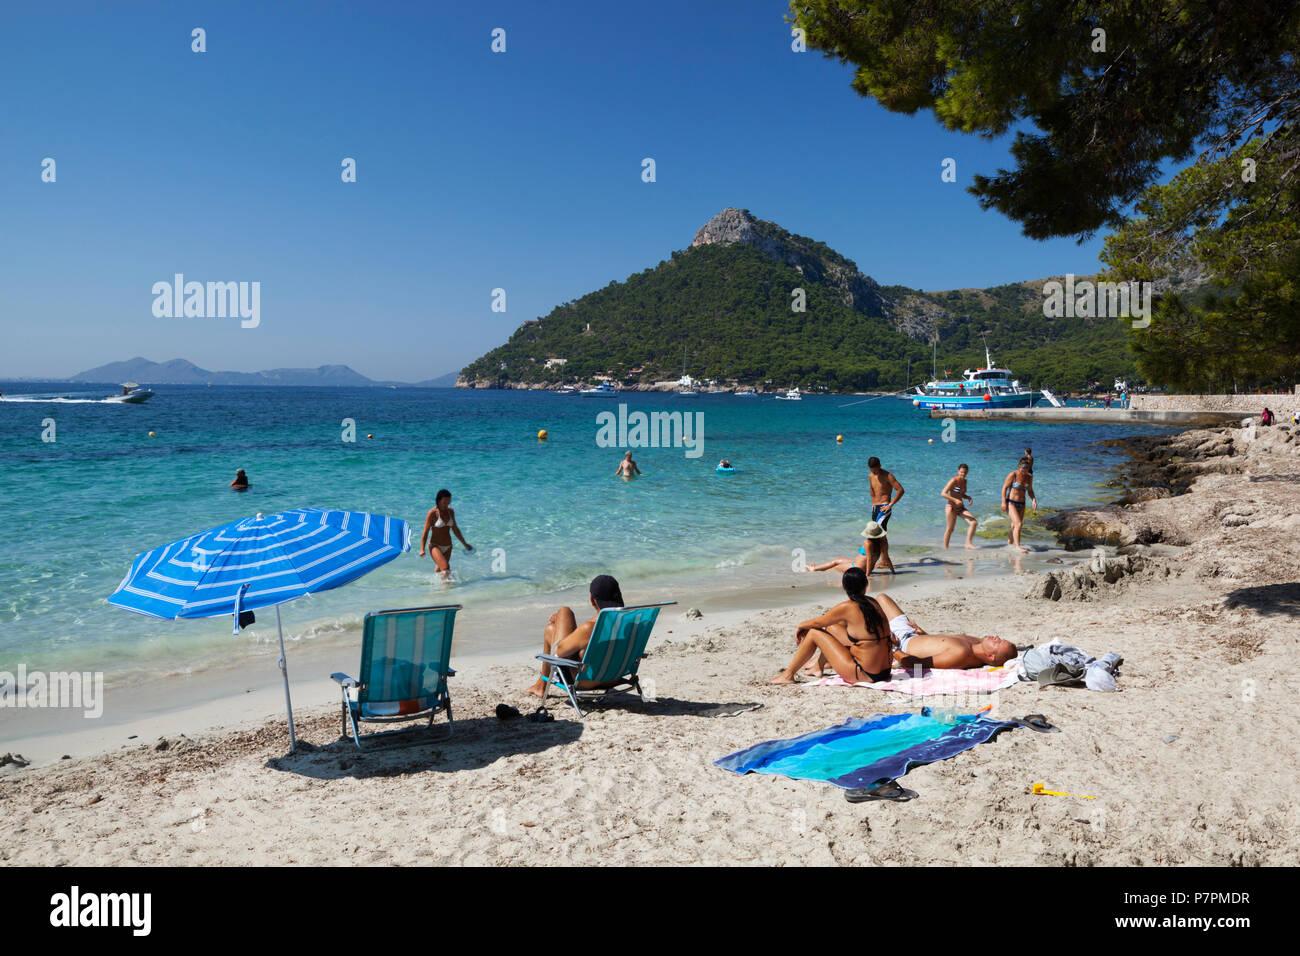 Platja Formentor (Playa de Formentor) near Port de Pollenca, Mallorca, Balearic Islands, Spain, Europe - Stock Image